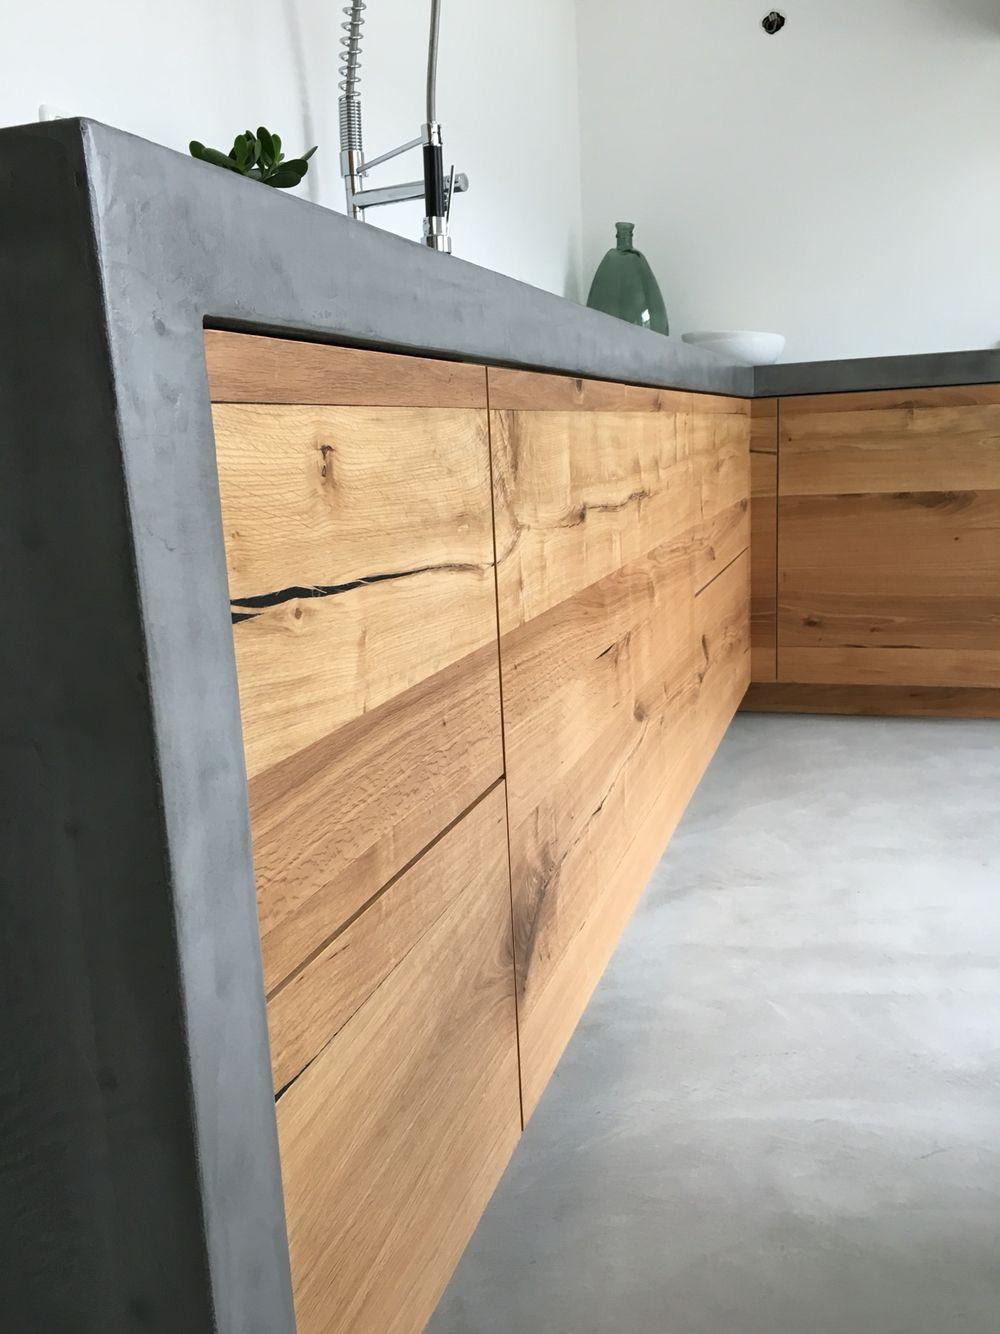 Voorkeur Keuken. Beton. Hout. Detail. Stoer. | loft opdracht portfolio &YF84